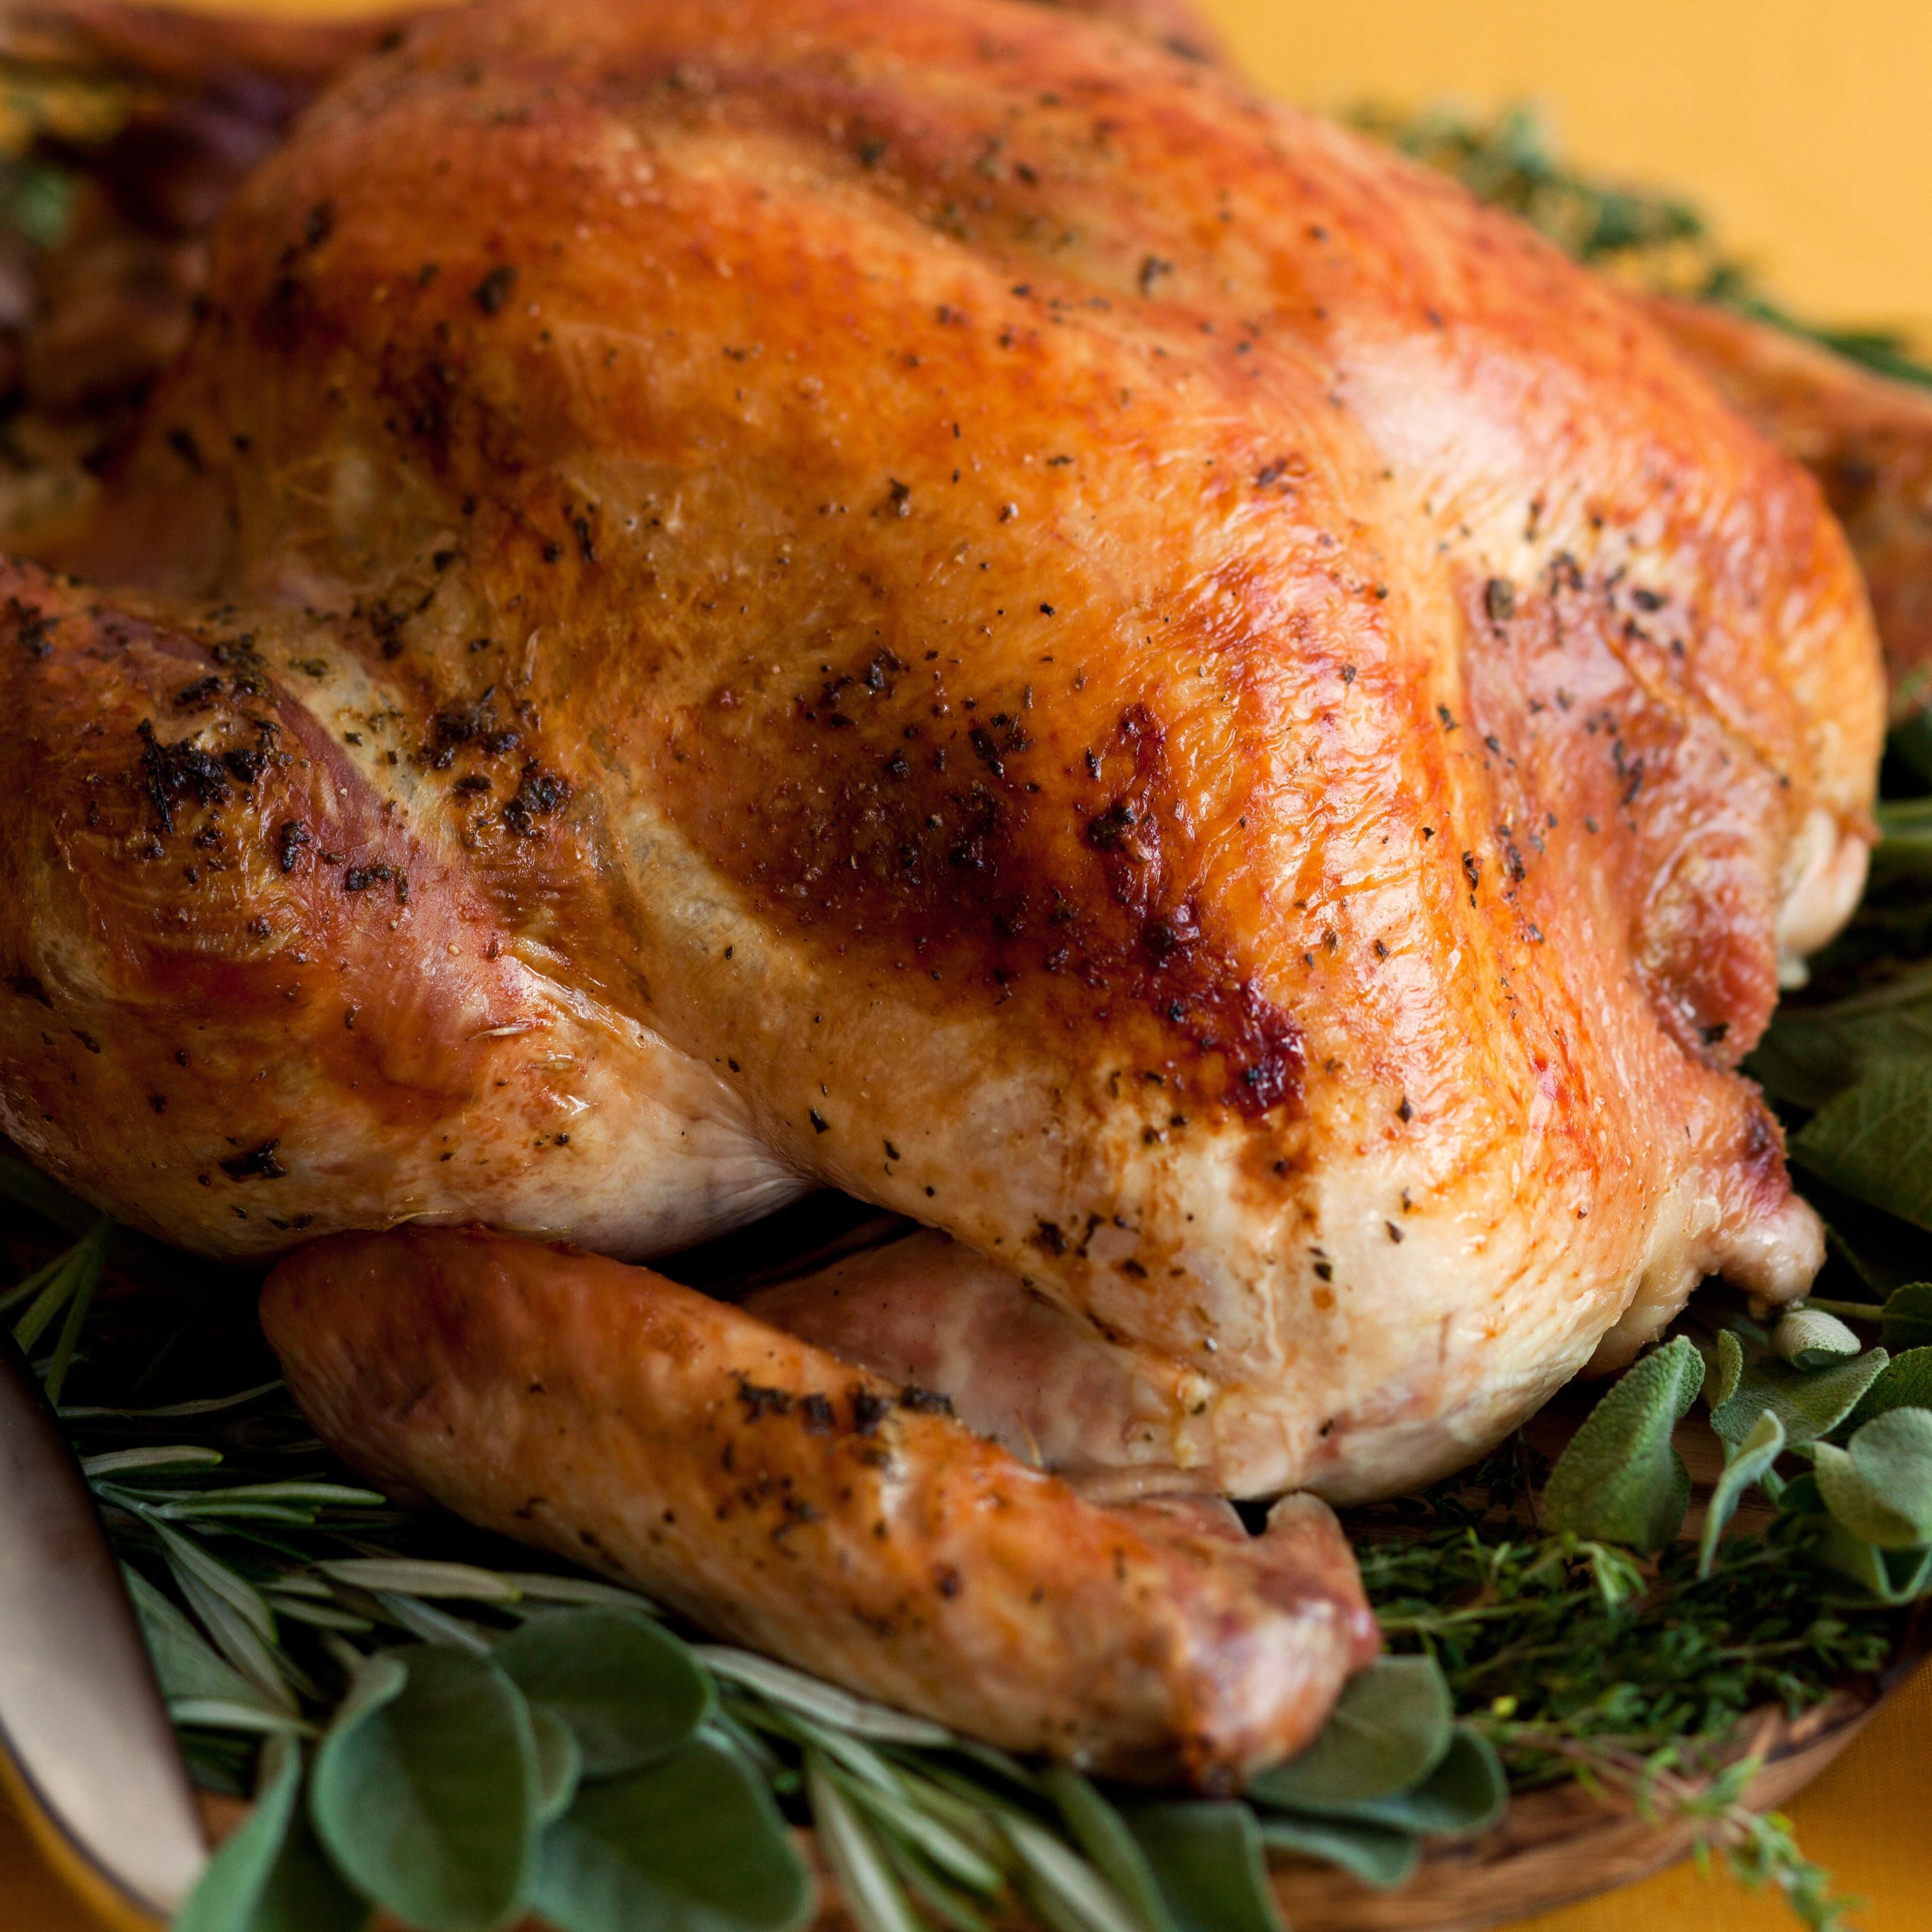 Roasted Turkey Recipes Thanksgiving  Herb Roasted Turkey recipe